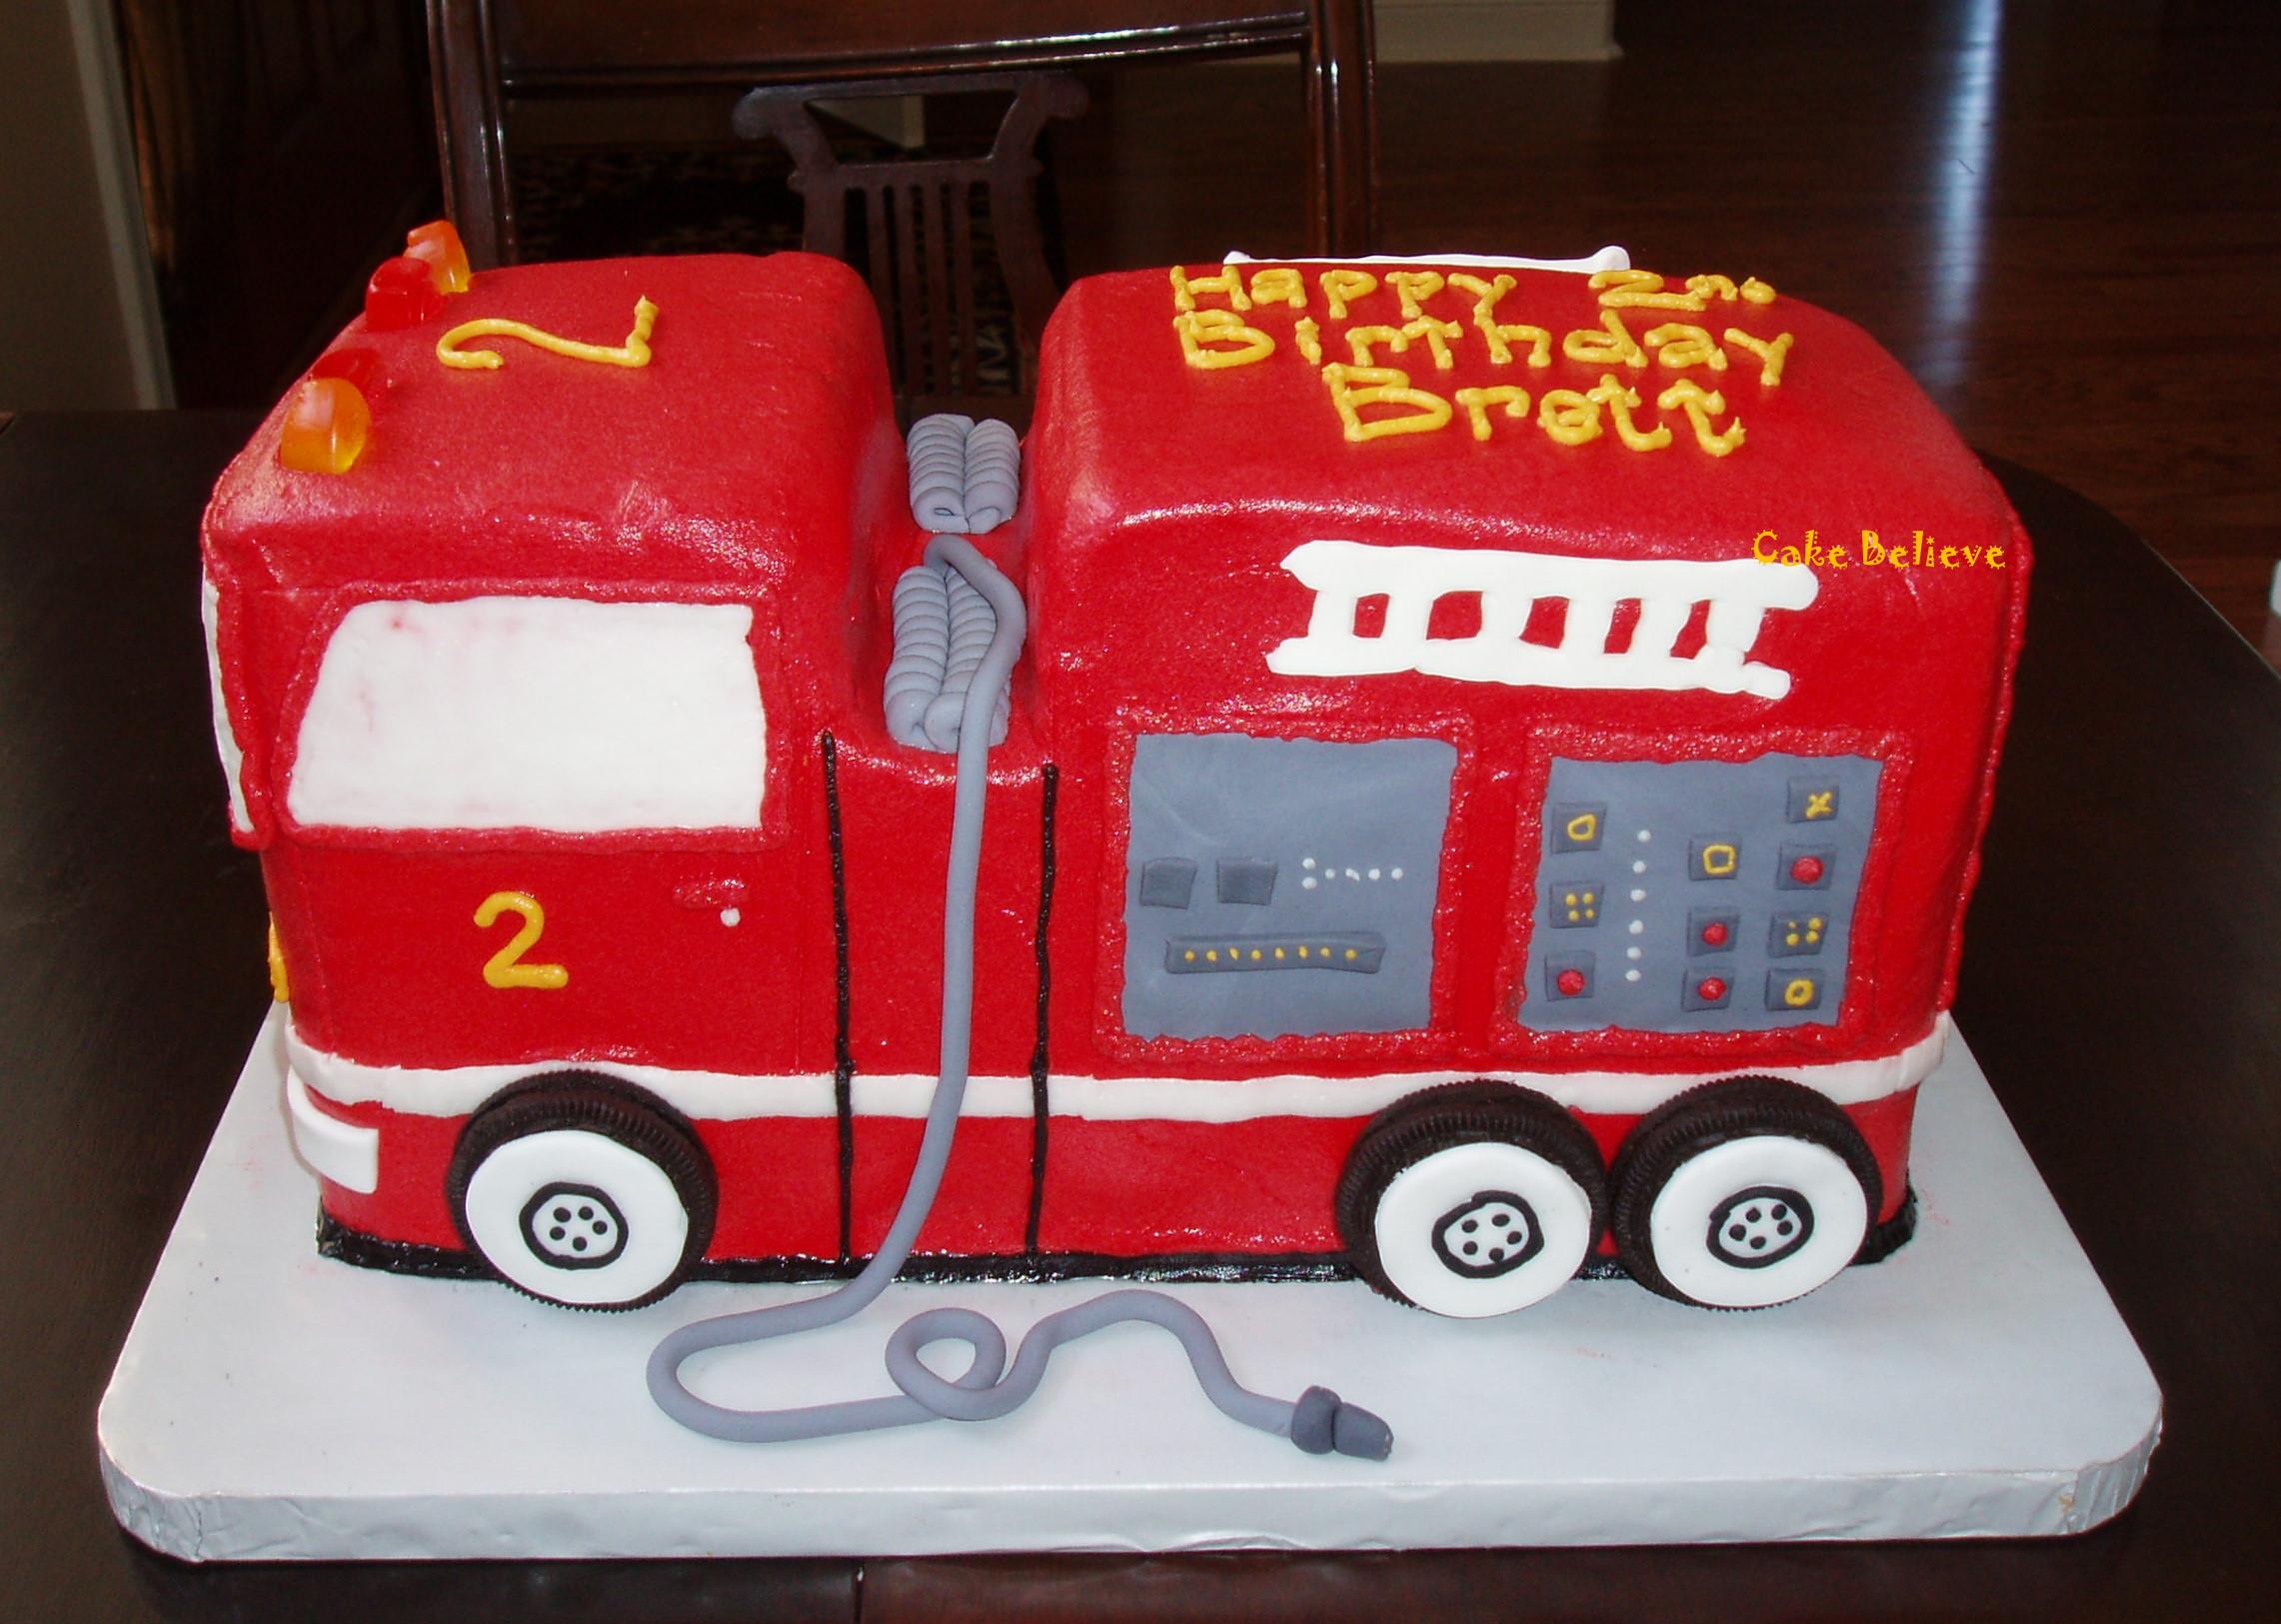 Peachy Fire Truck Cakes Decoration Ideas Little Birthday Cakes Funny Birthday Cards Online Overcheapnameinfo